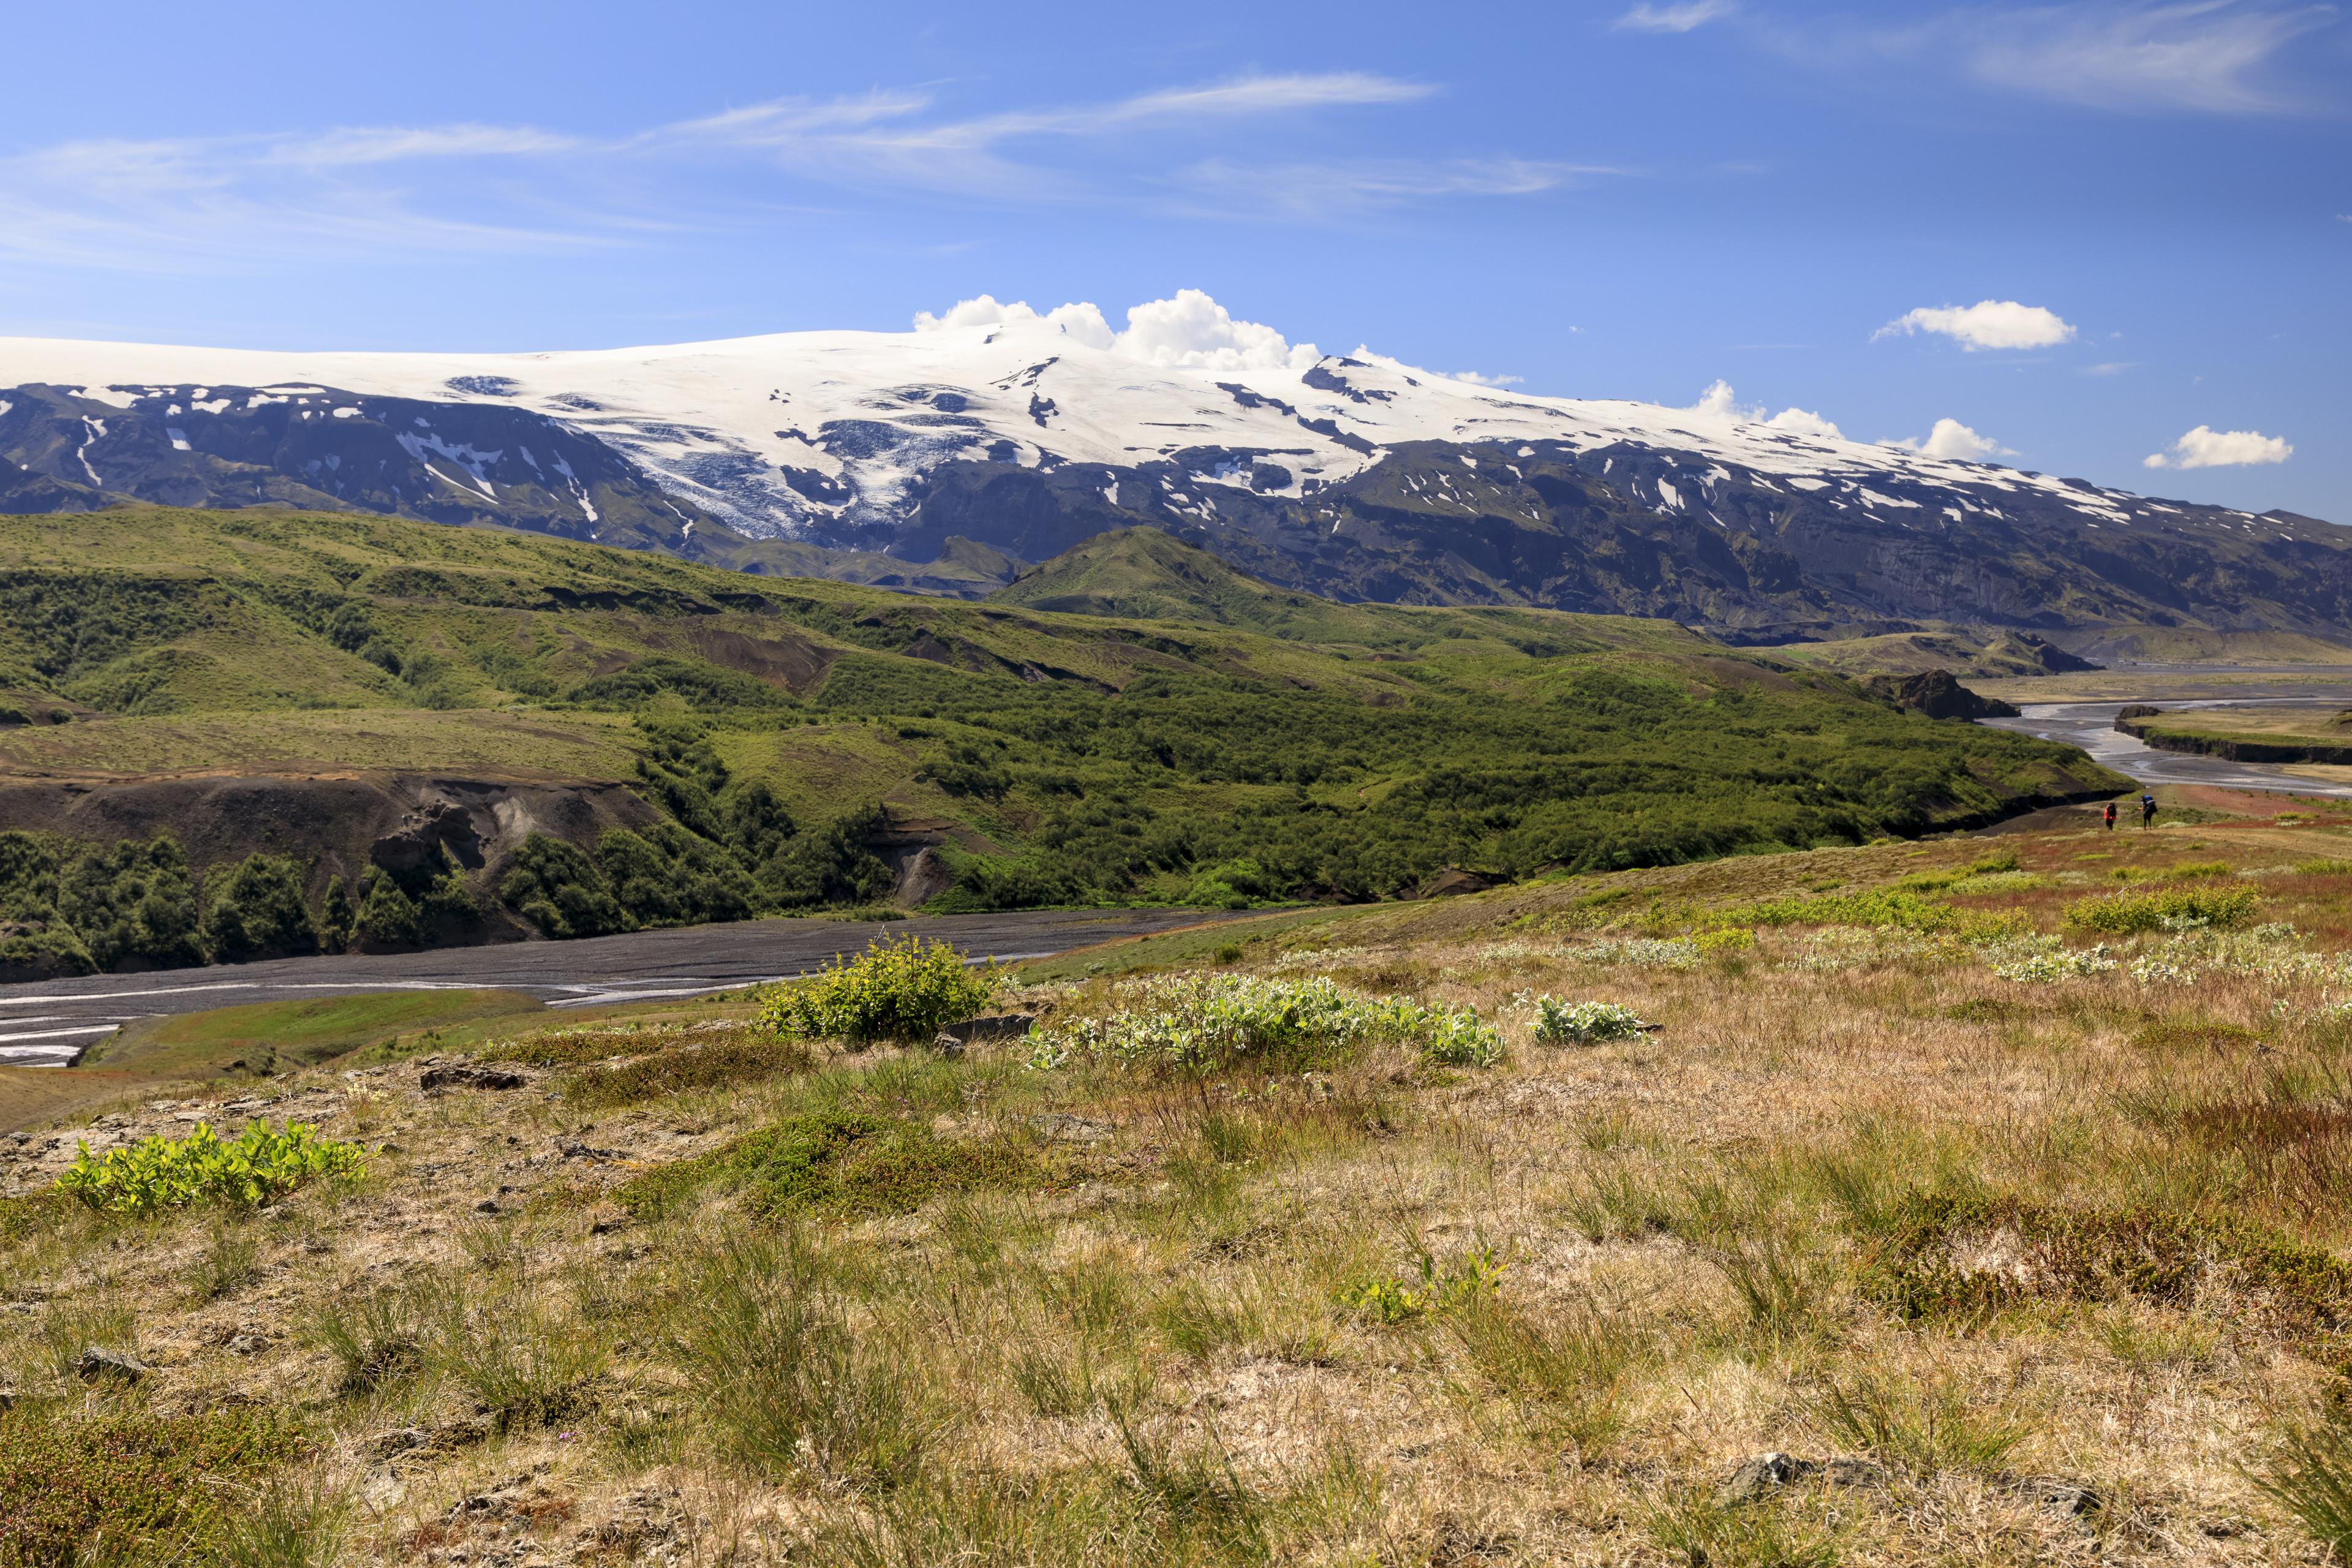 Þórsmörk, Eyjafjallajökull, Þröngá und Markarfljót